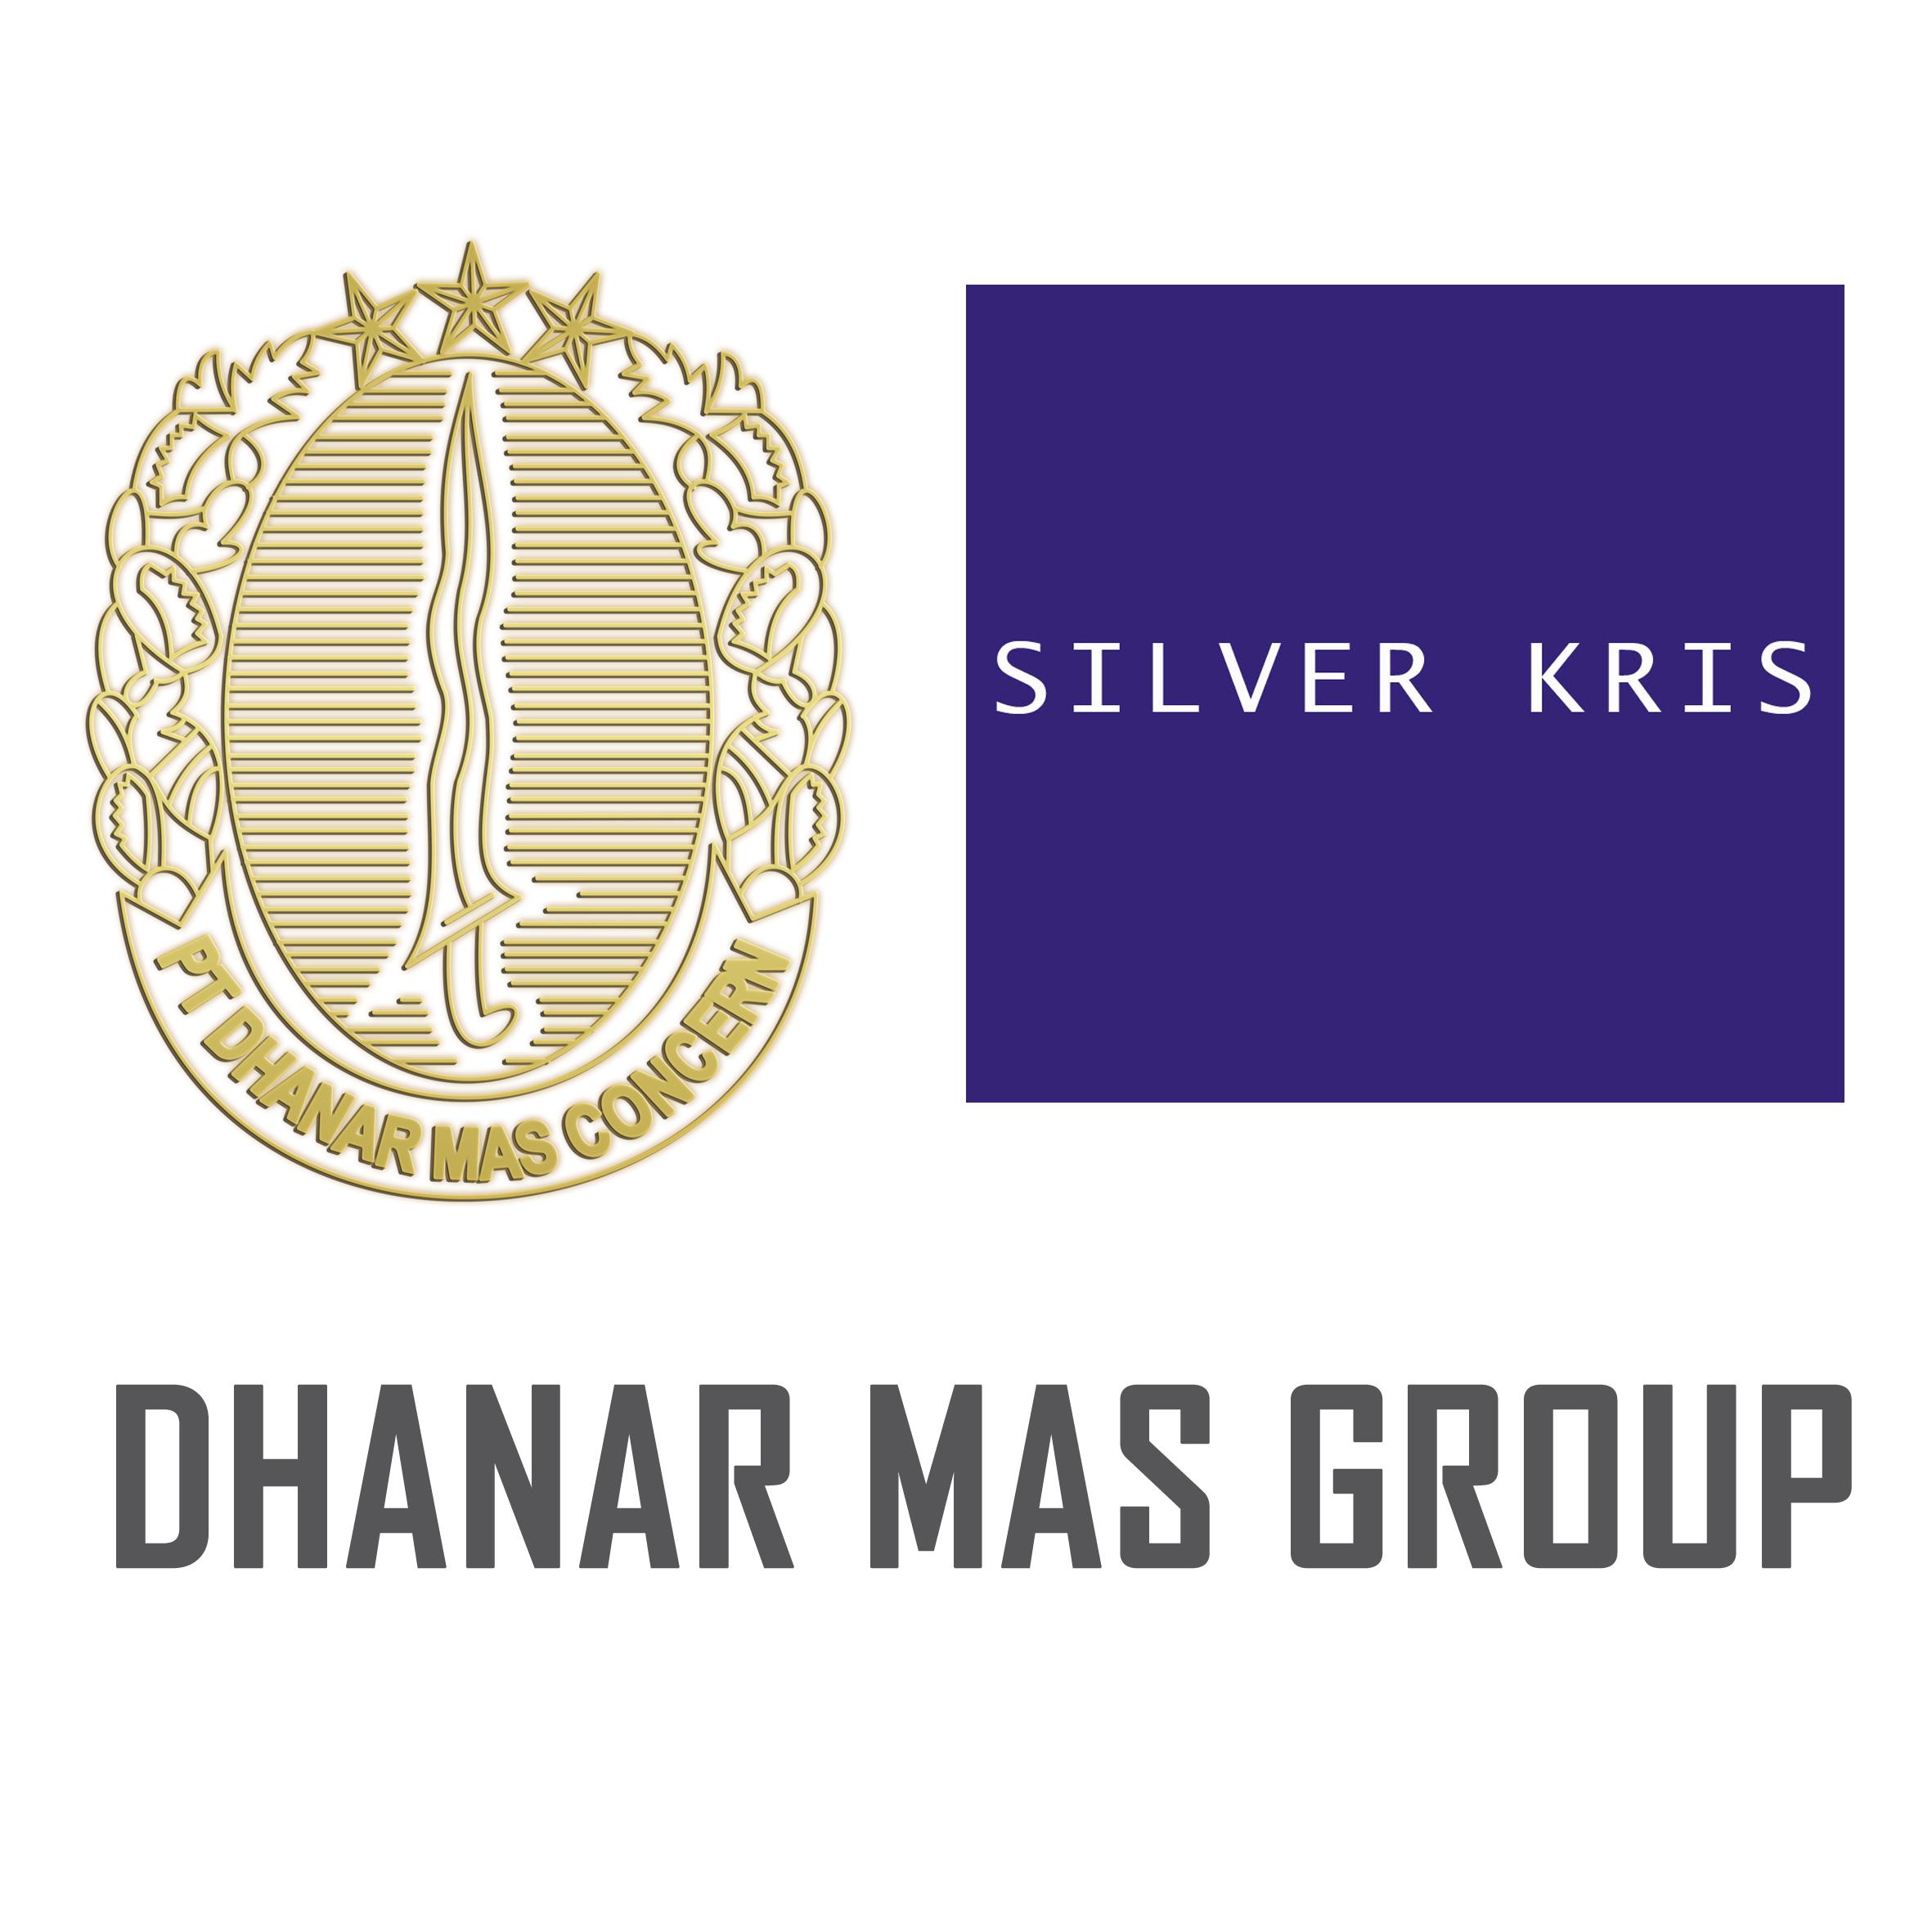 Financial Analyst Dhanar Mas Concern Pt Indonesia Desember 2020 Lokerjos Xyz Lowongan Pekerjaan Terbaru